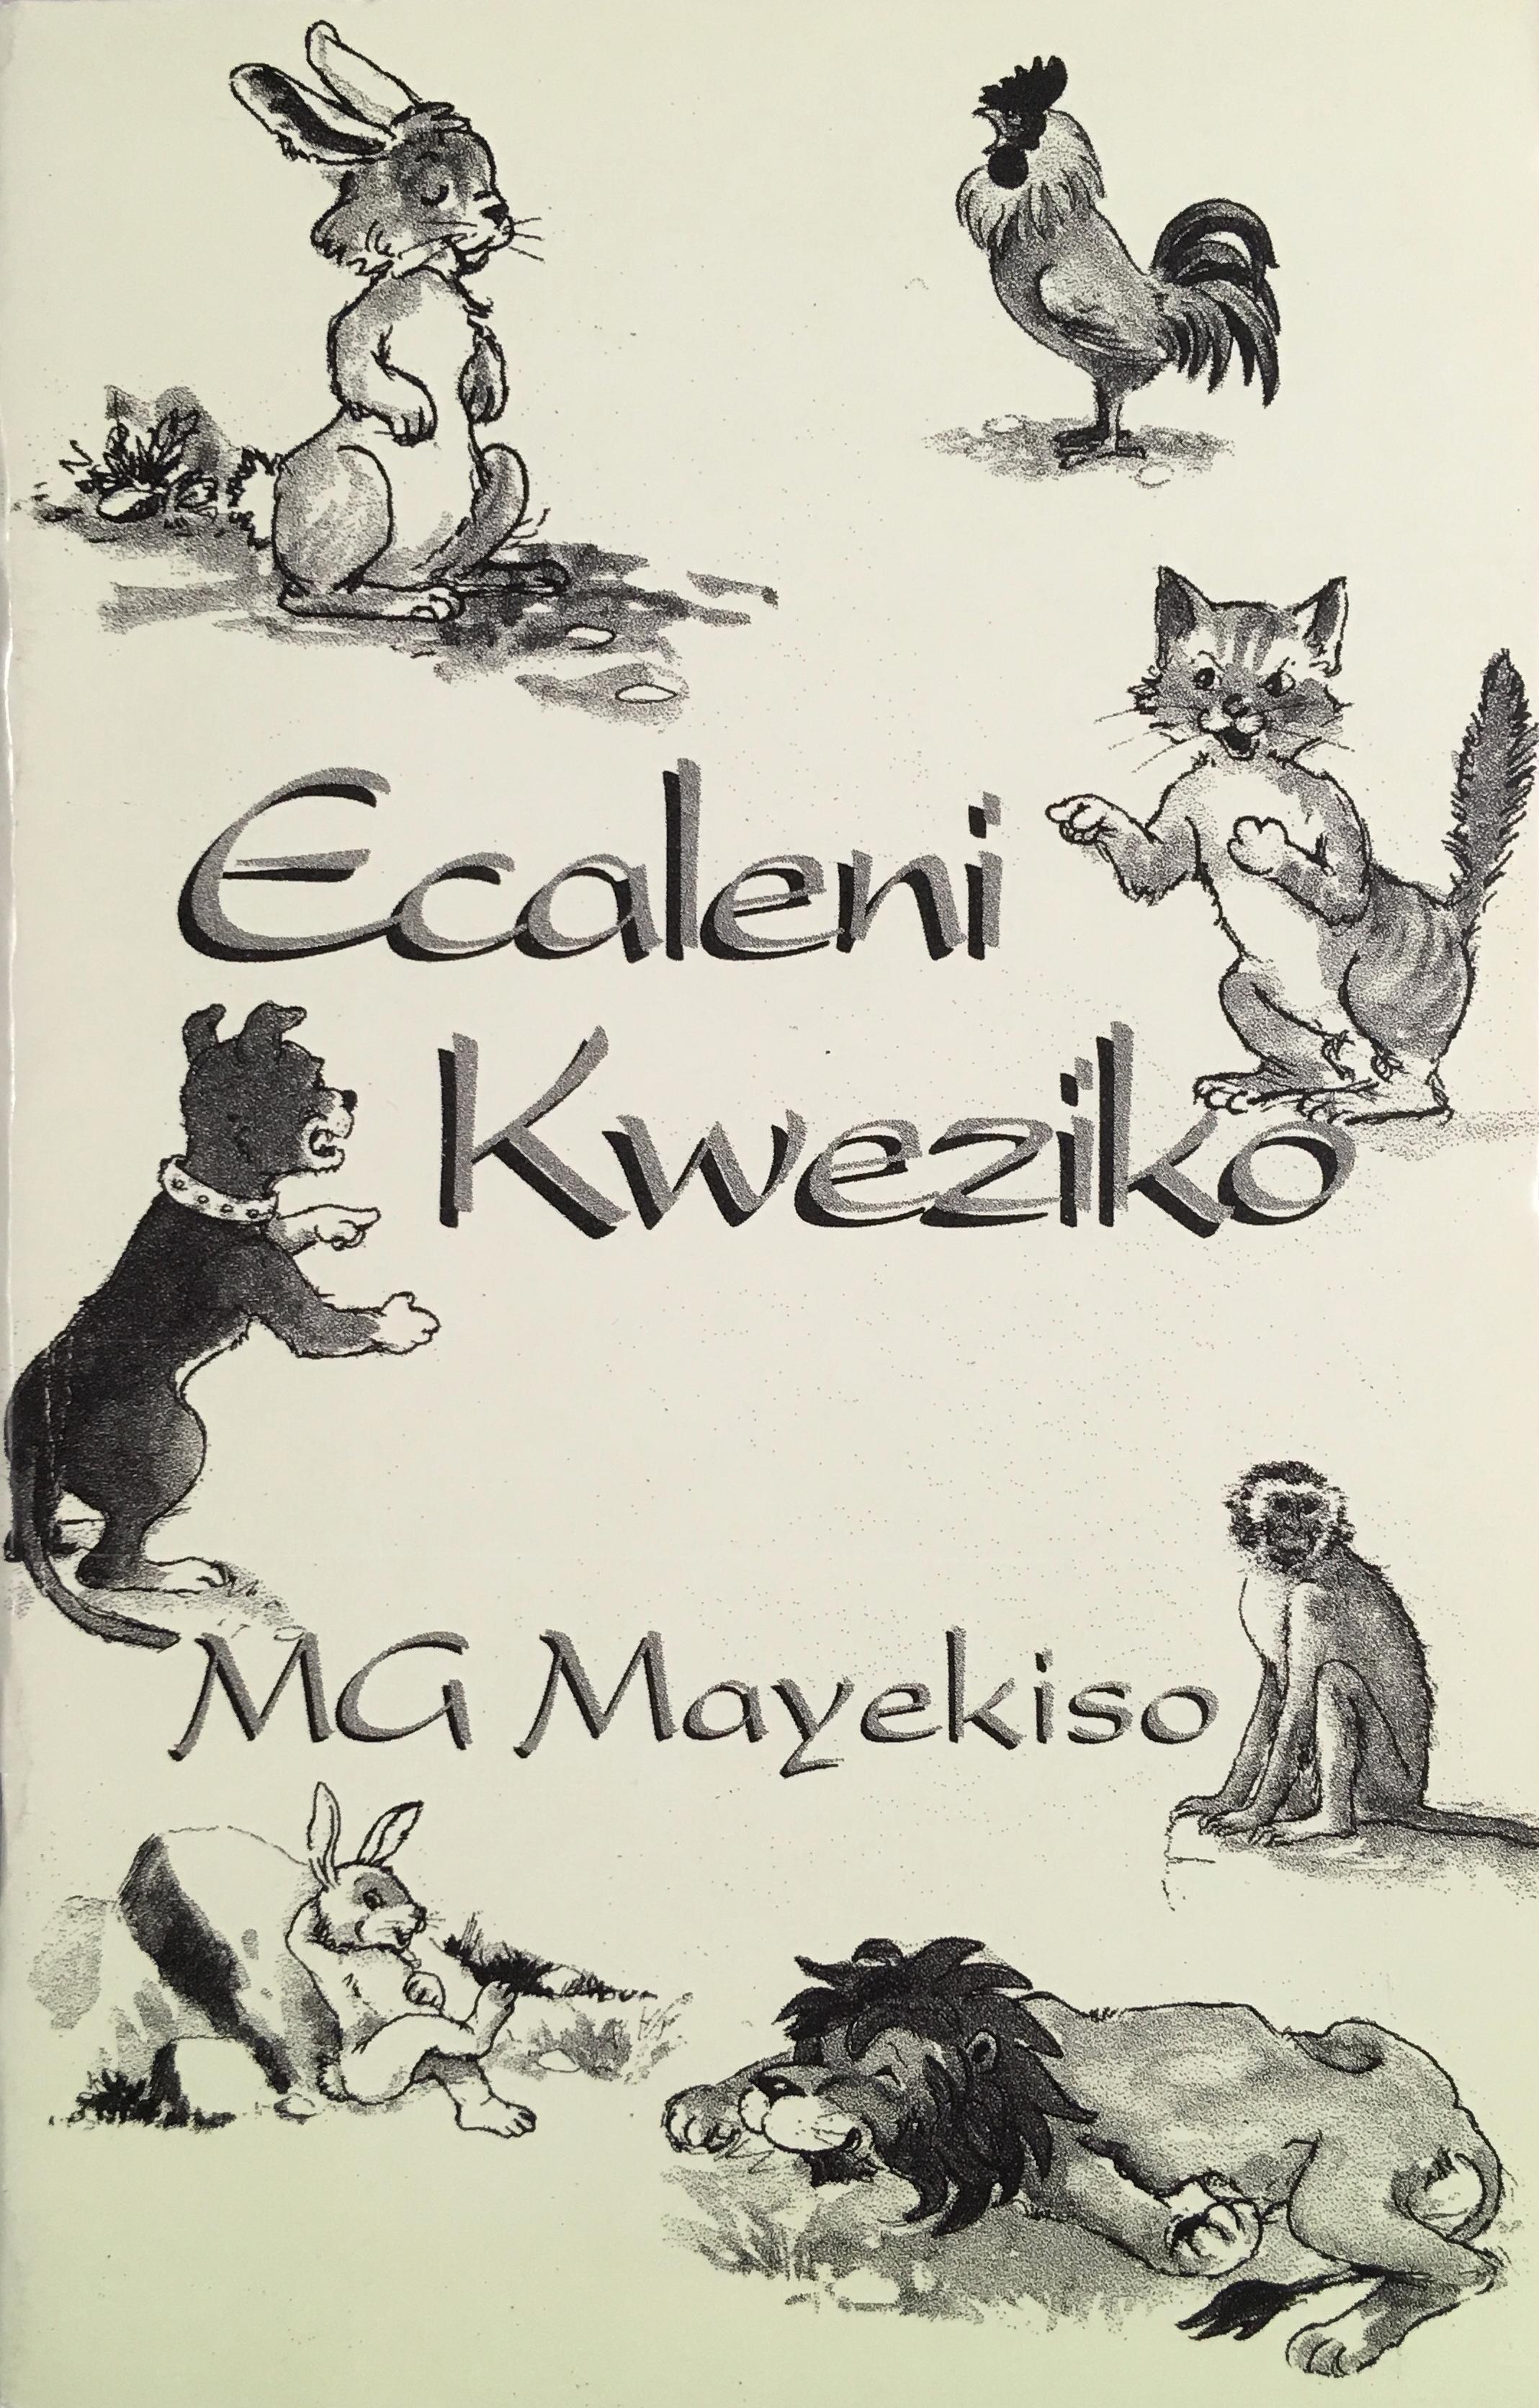 Picture of Ecaleni kweziko : Xhosa folklore